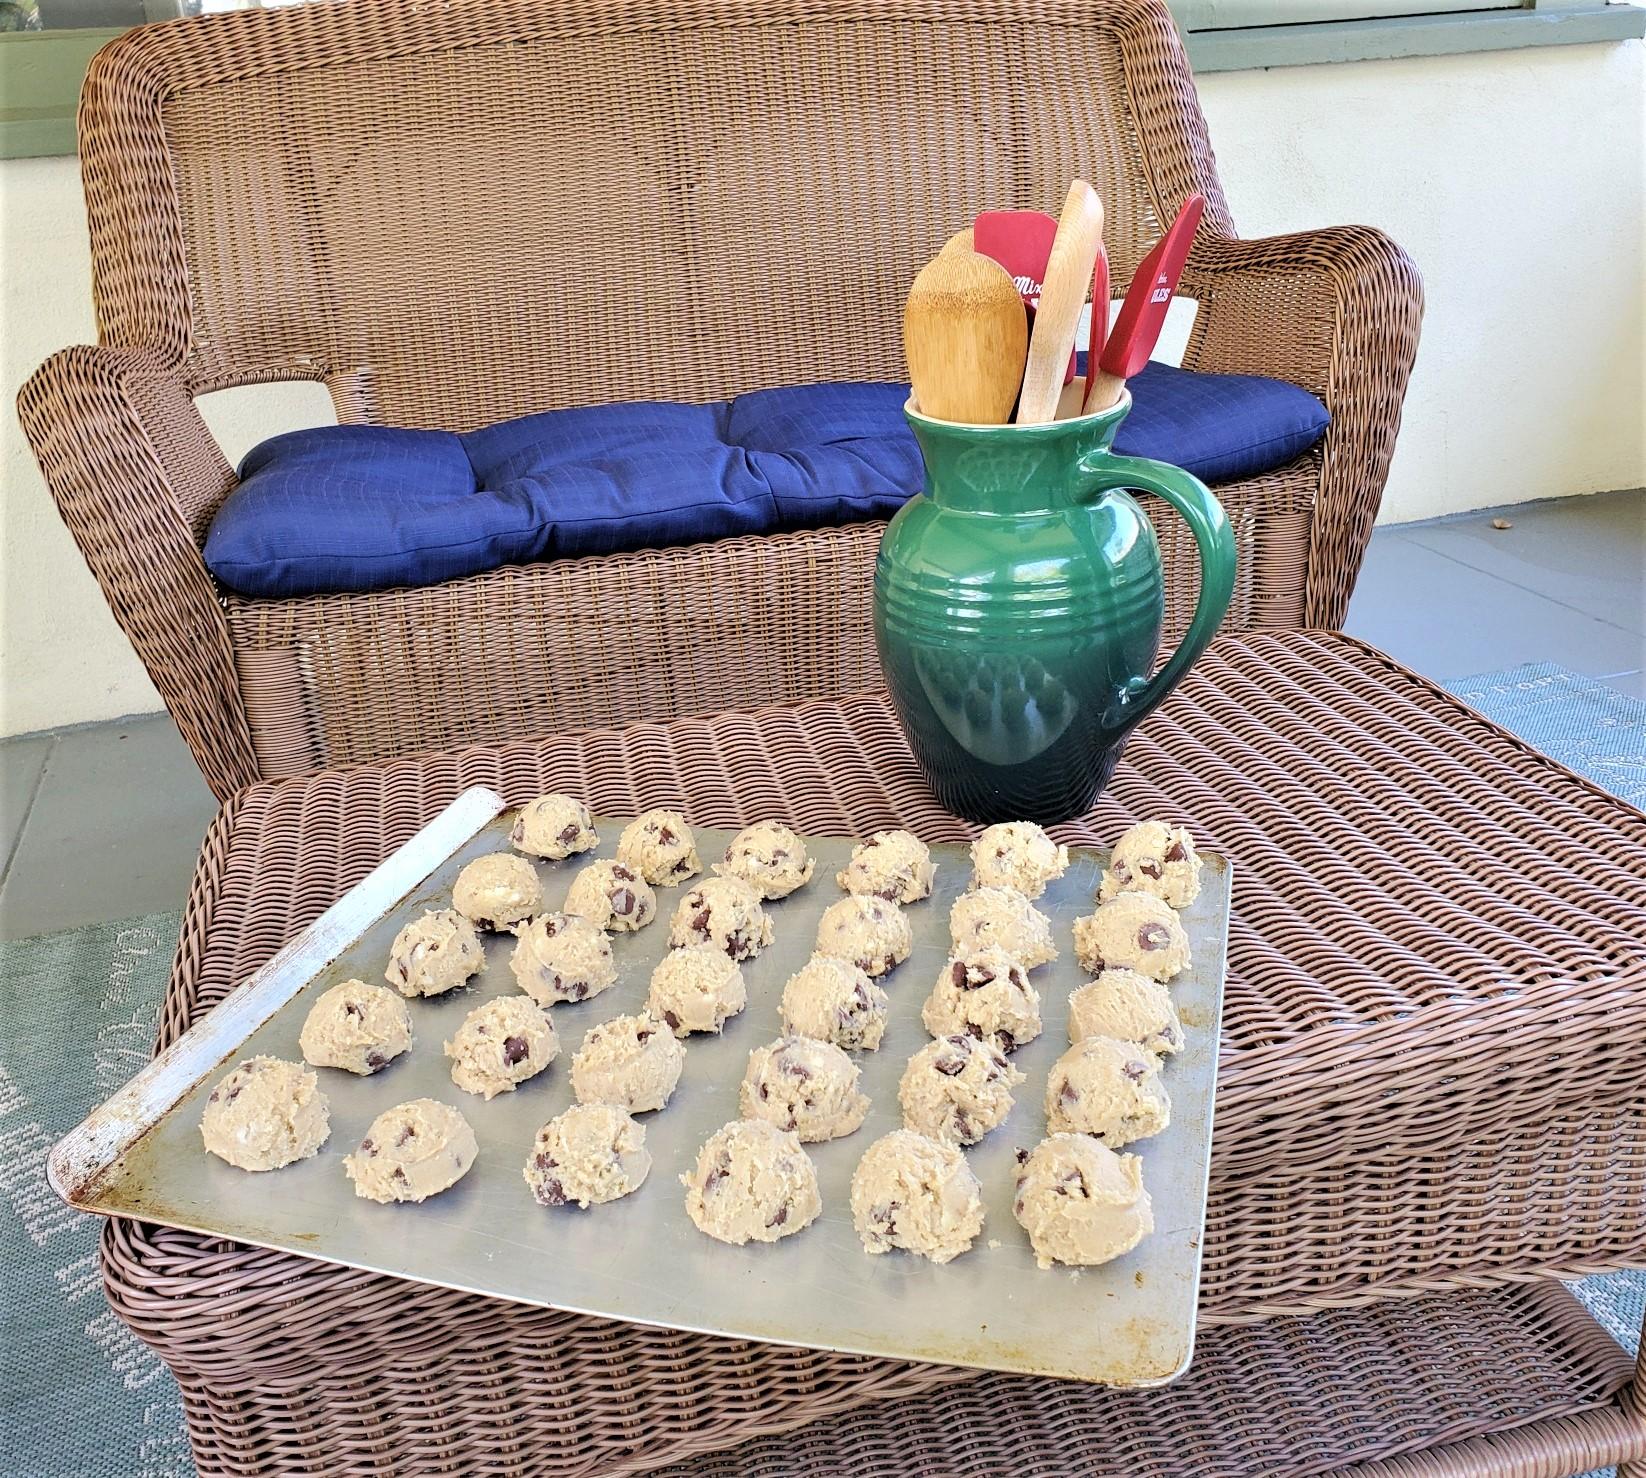 red sofa set and turquoise wall color for incredible.htm homepage big slide coronado times page 21  homepage big slide coronado times